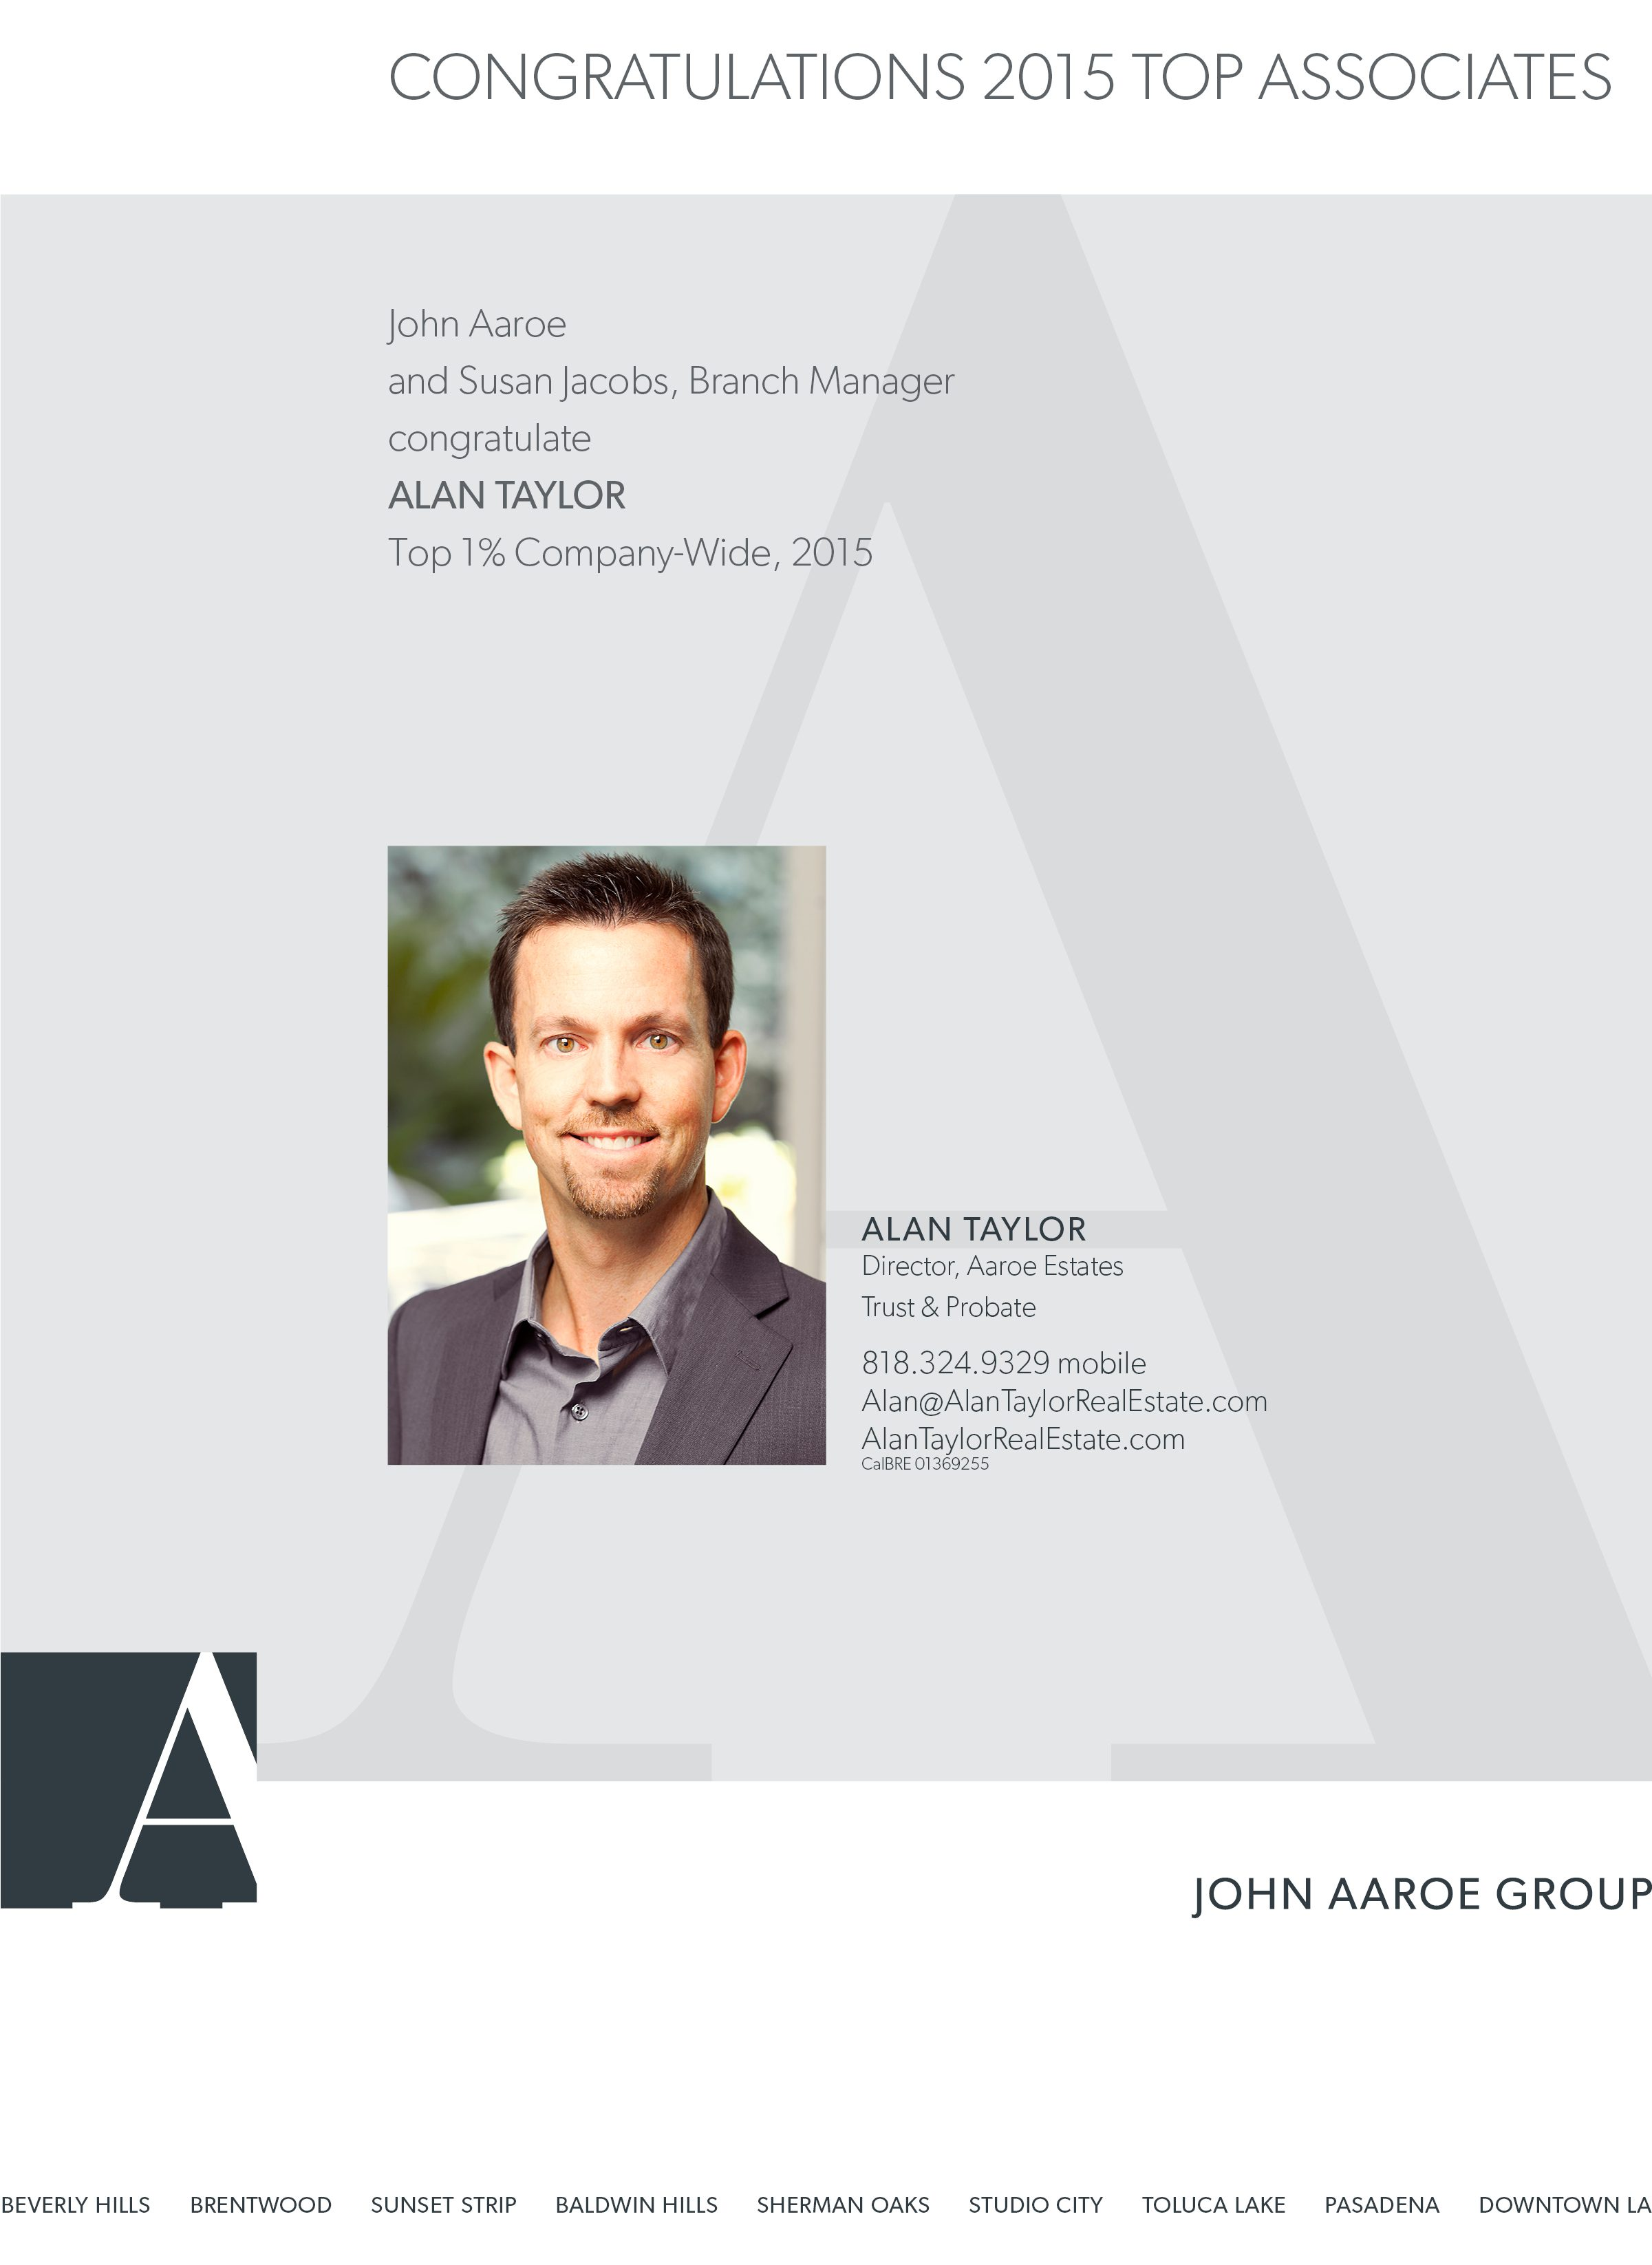 Alan Taylor, Top 1% Company-Wide, 2015